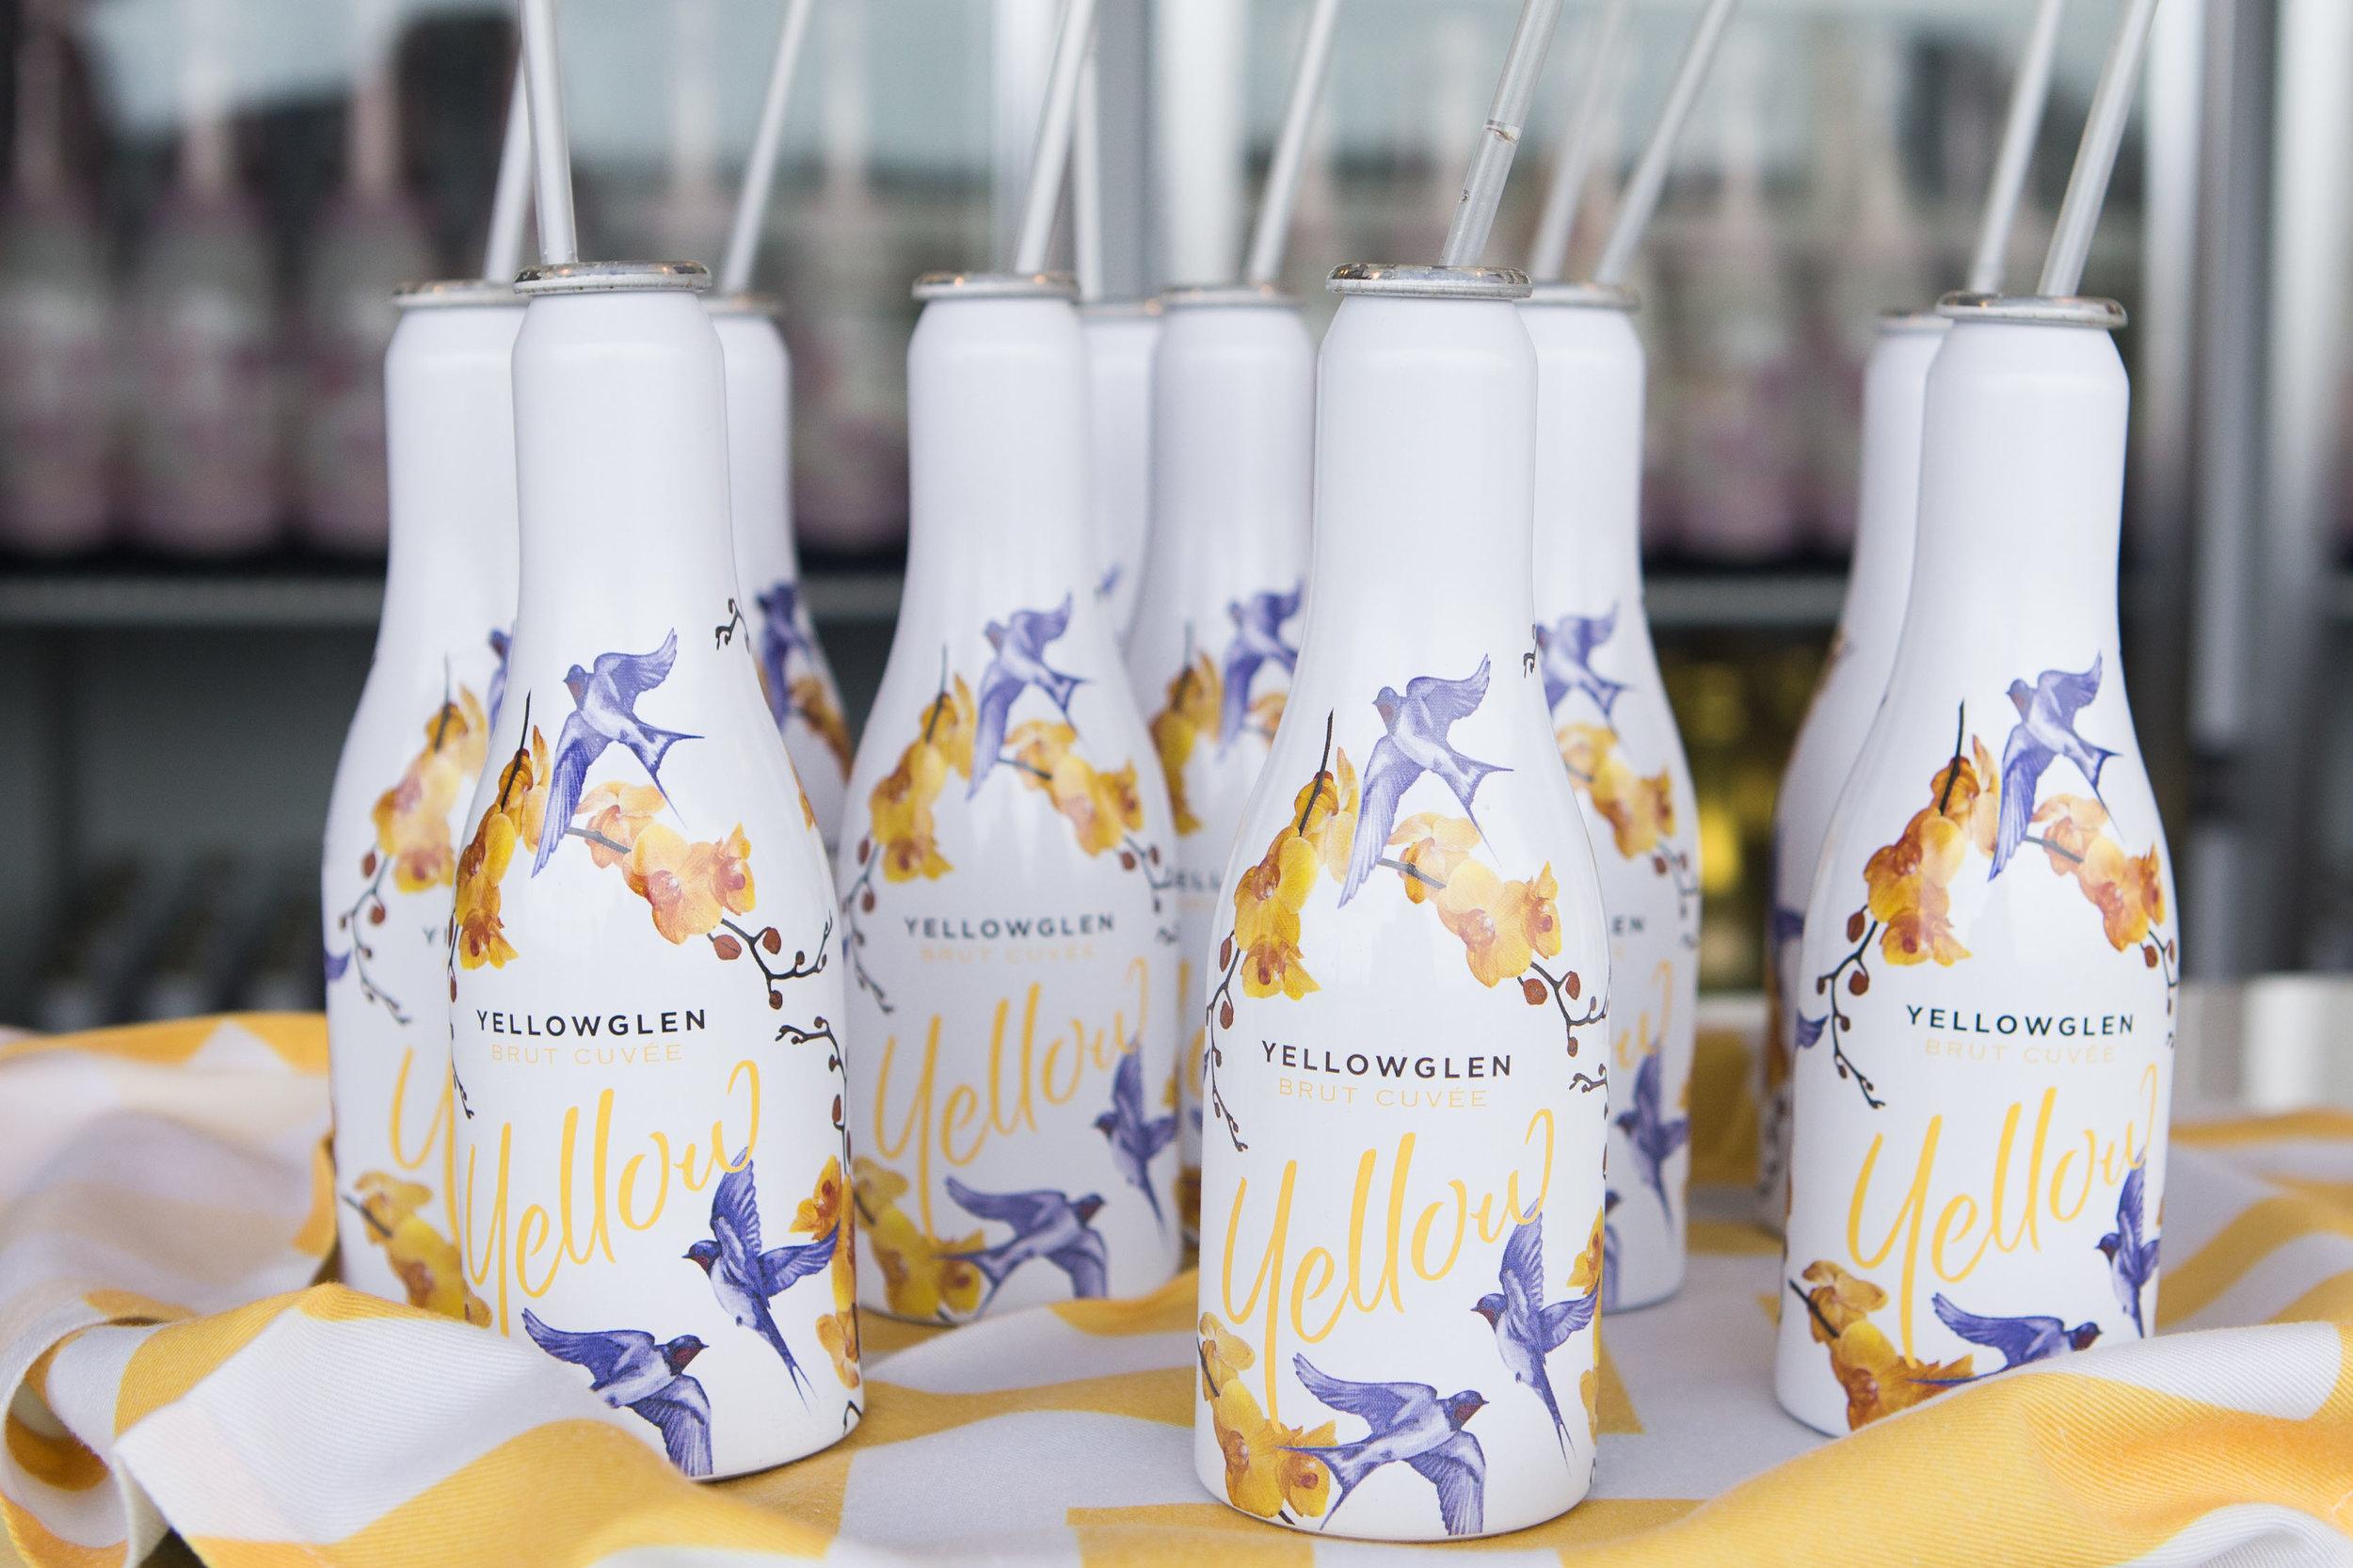 yellowglen-terrace-sofitel-girls-day-out-2016-drinks-1.jpg